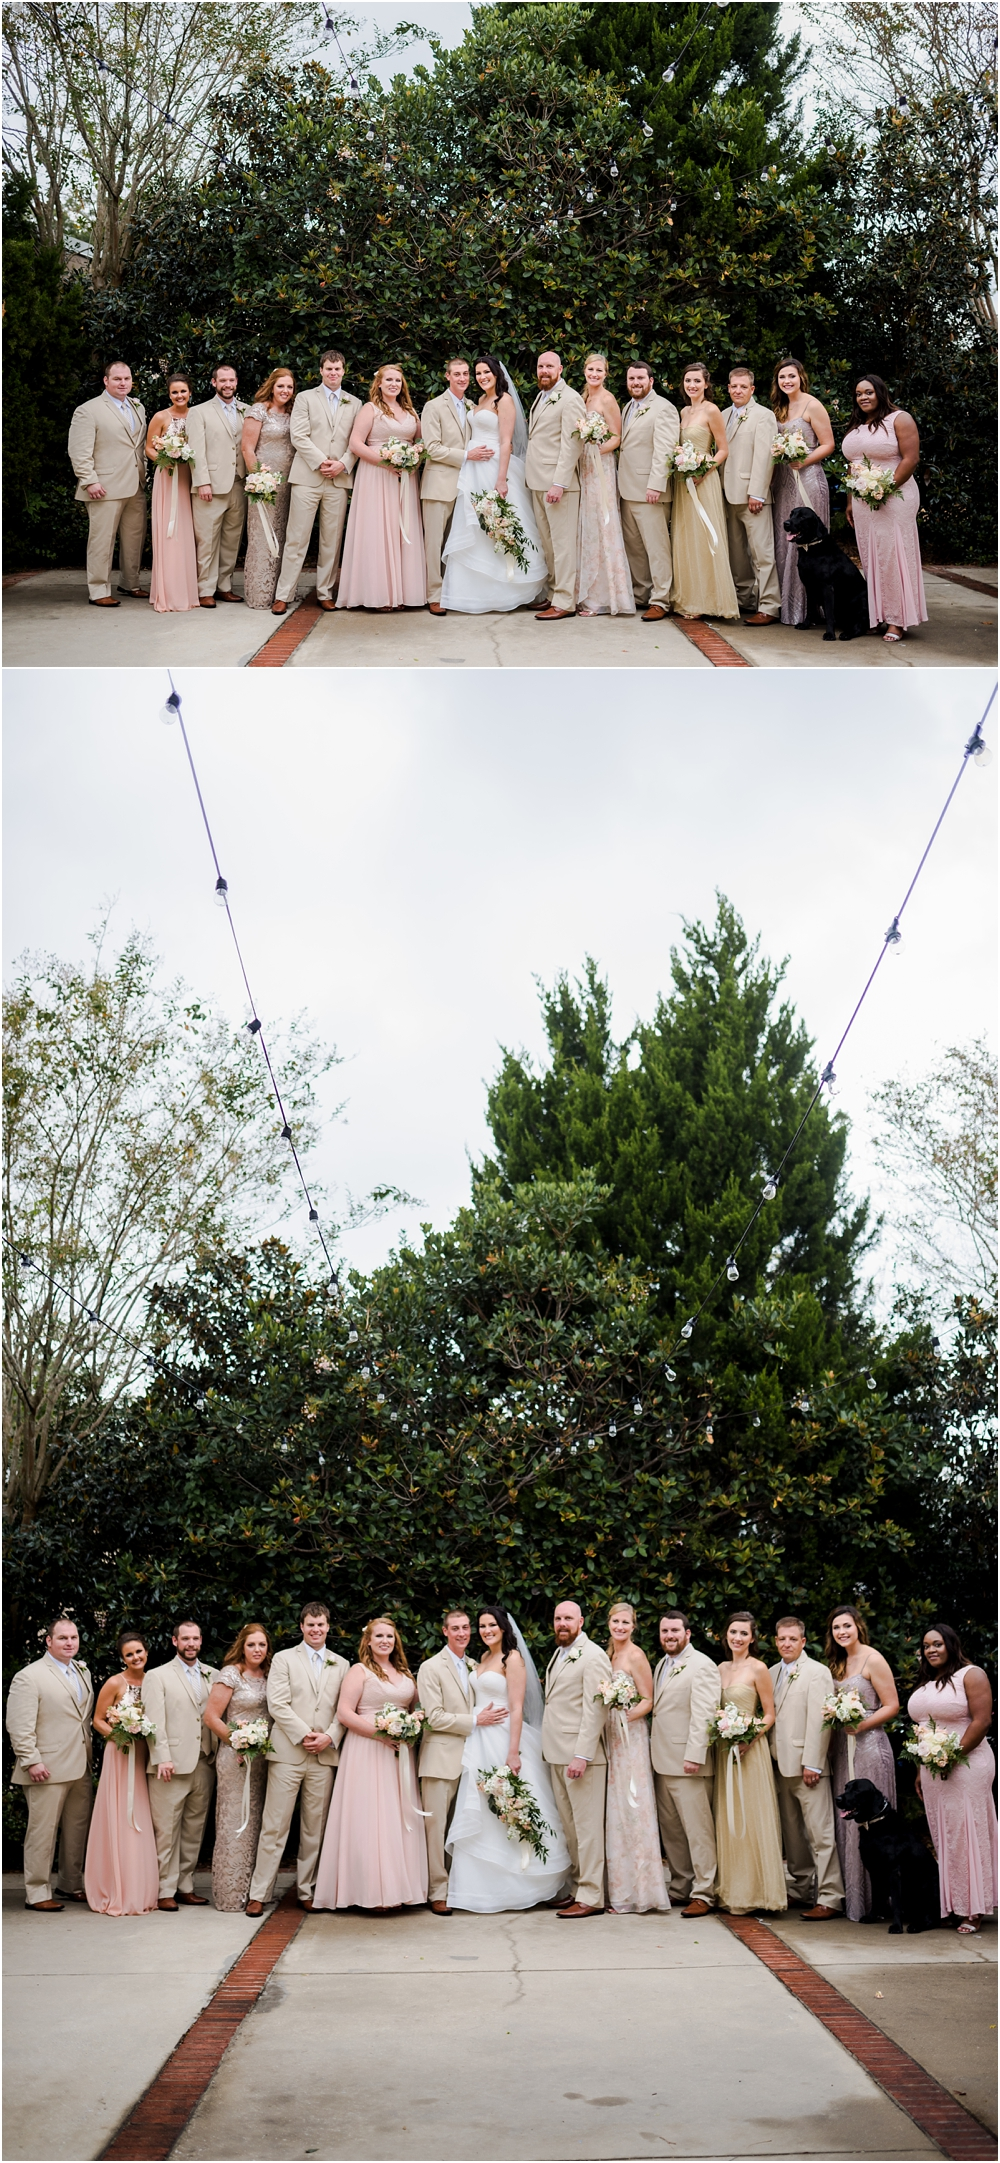 pensacola-wedding-photographer-kiersten-grant-74.jpg